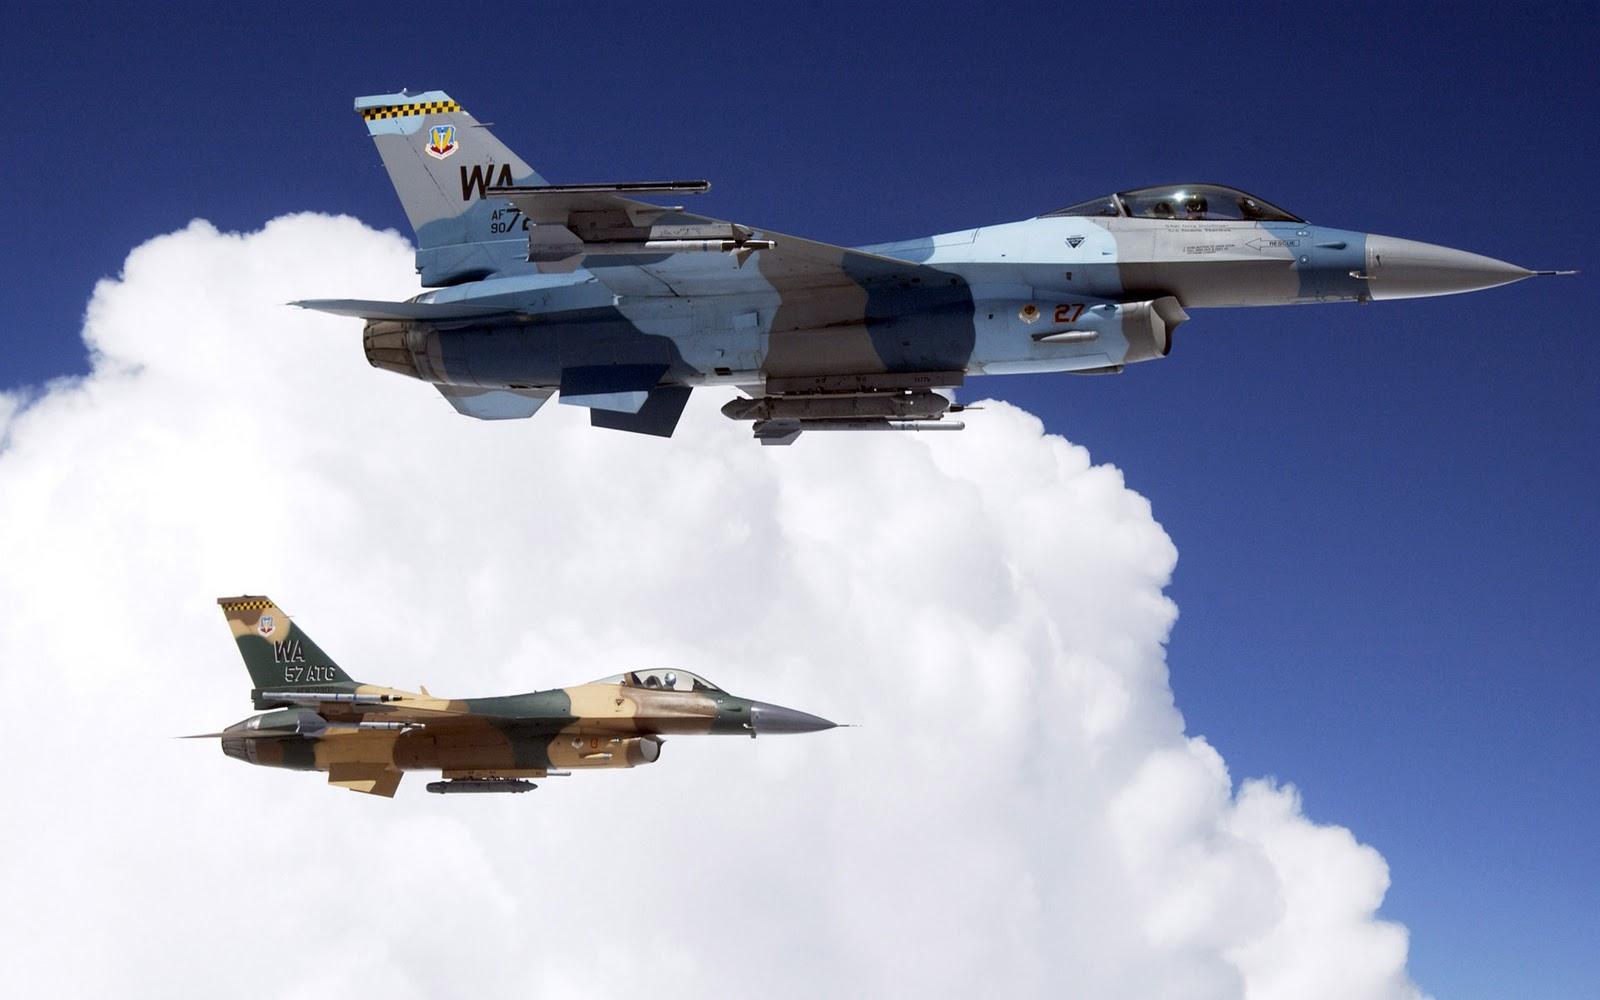 http://2.bp.blogspot.com/-I_ZZ_t9Xtxg/TosARzteObI/AAAAAAAANgo/ShM7vQF2yhs/s1600/Mooie-militaire-gevechtsvliegtuigen-achtergronden-hd-gevechts-vliegtuigen-wallpapers-13.jpg